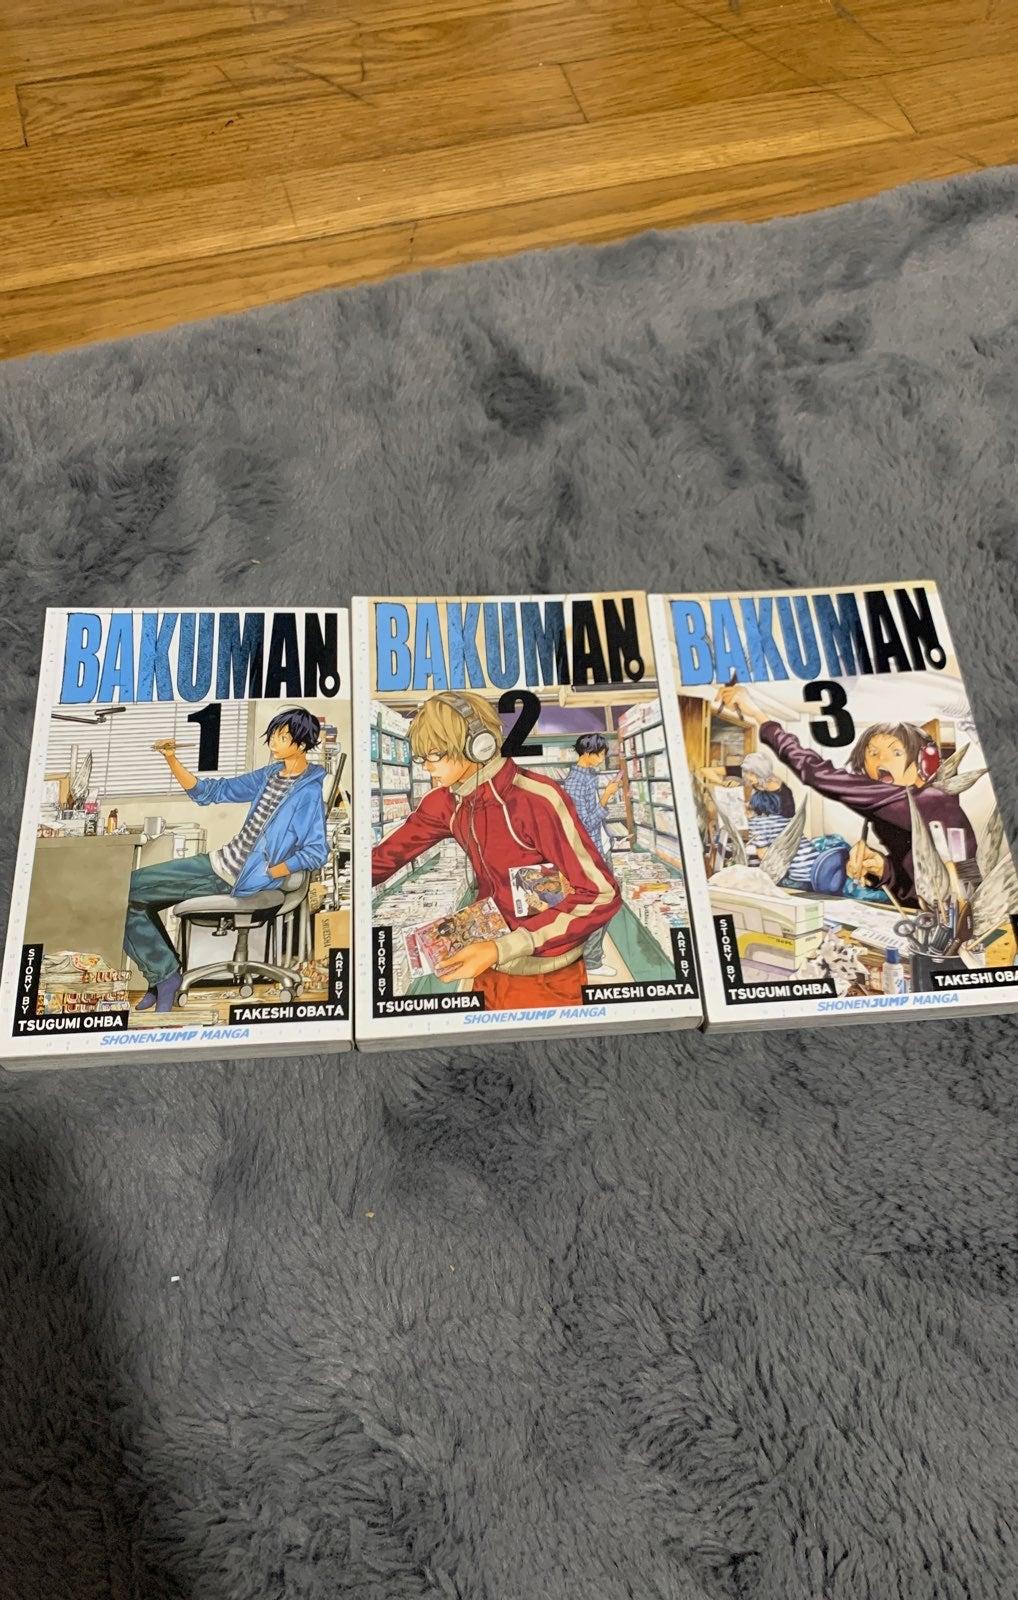 Bakuman Manga Volumes 1-3 Shonen Jump